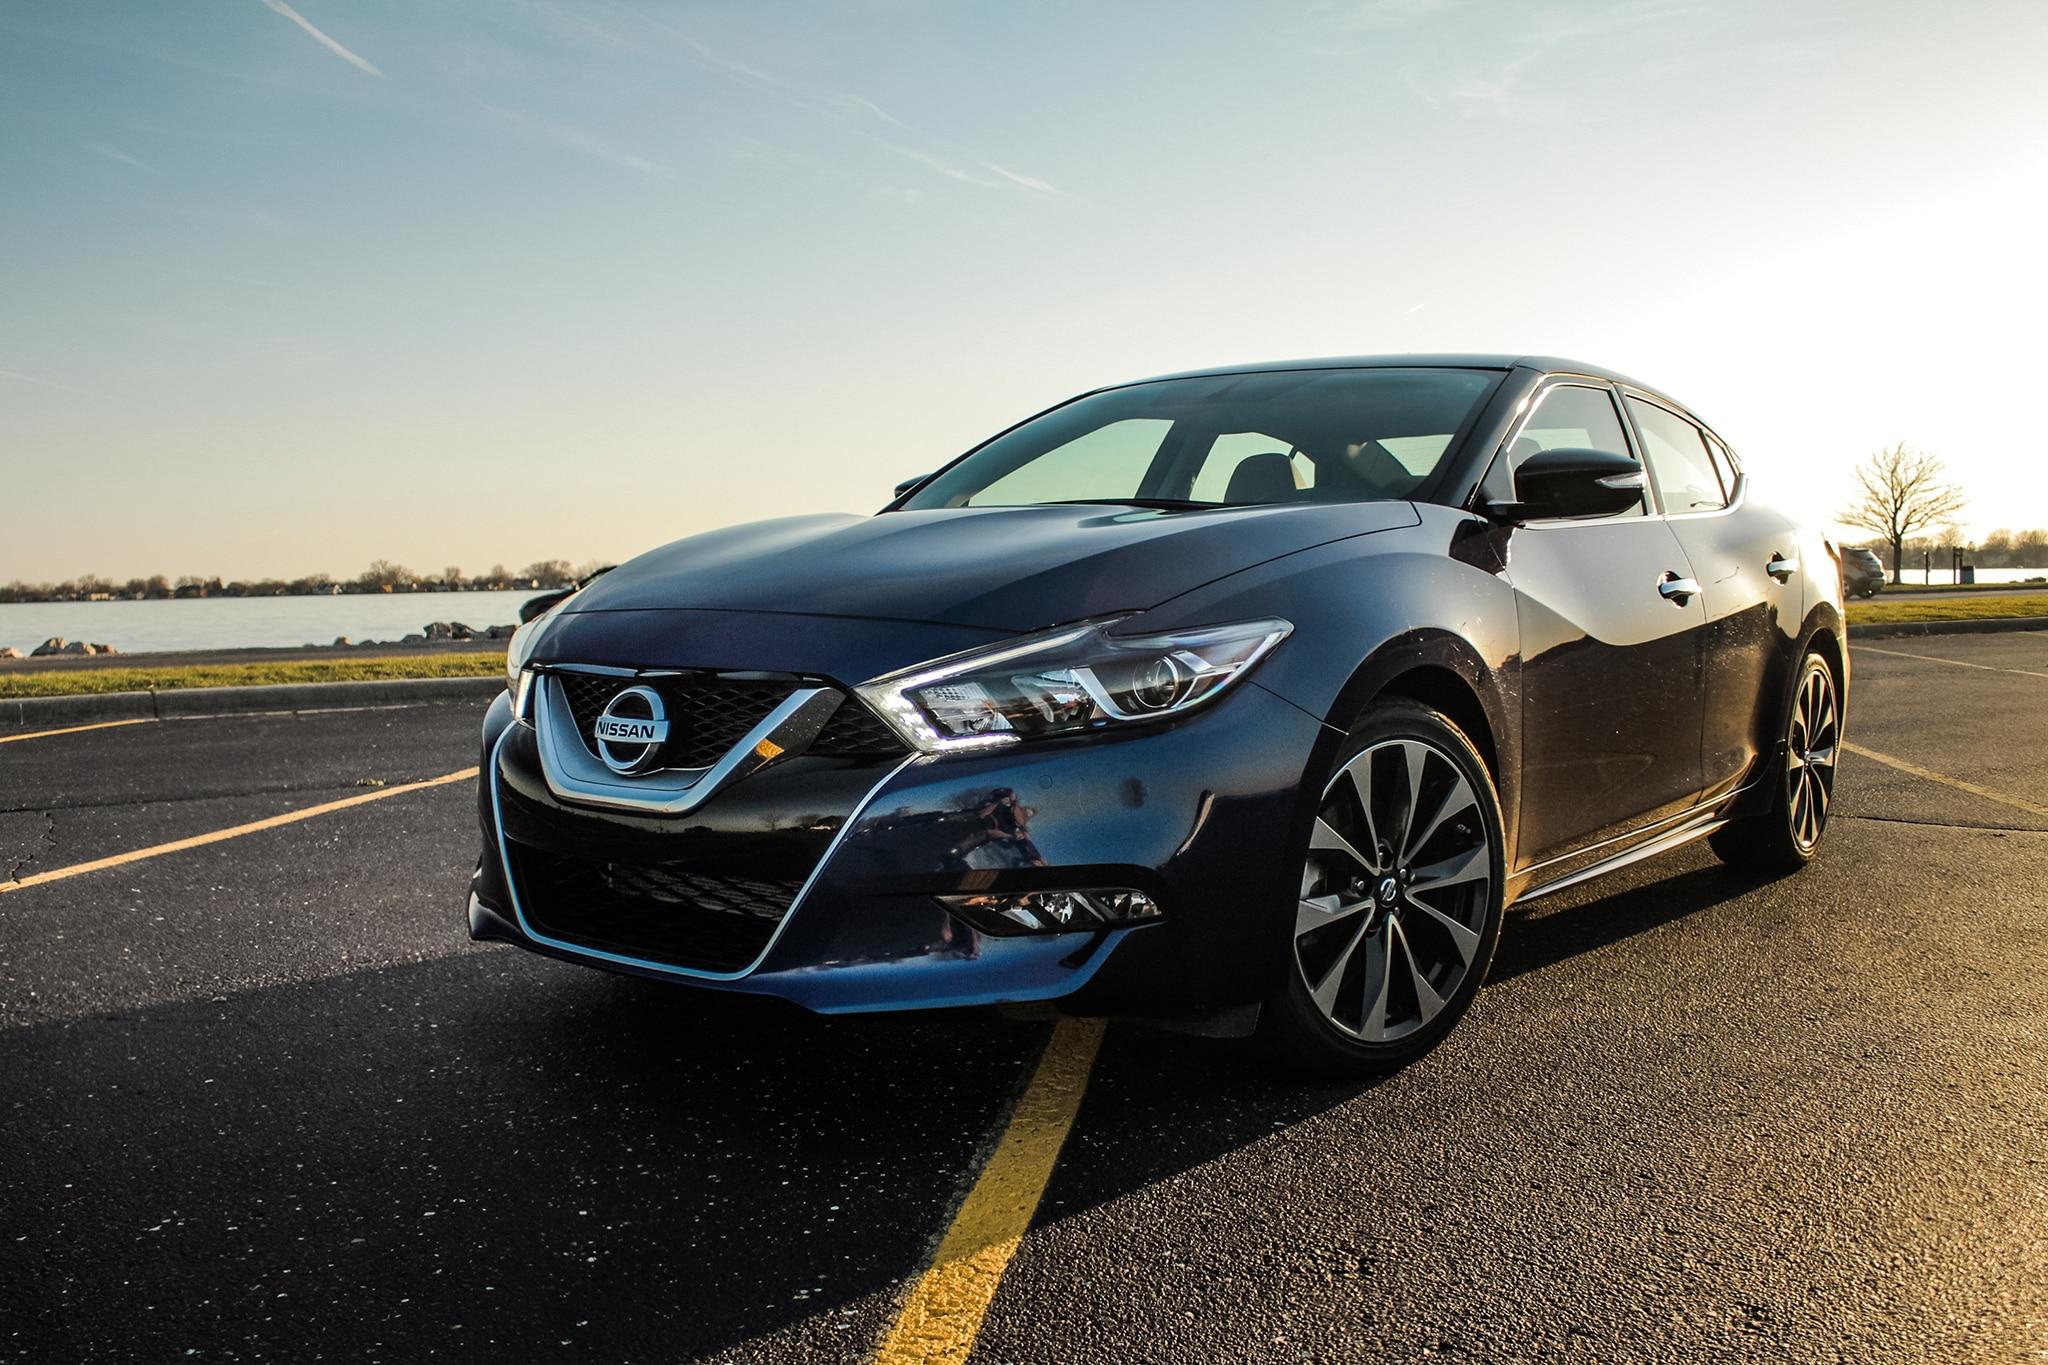 2016 Nissan Maxima SR – A Boulevard Cruiser That Eats Up Miles